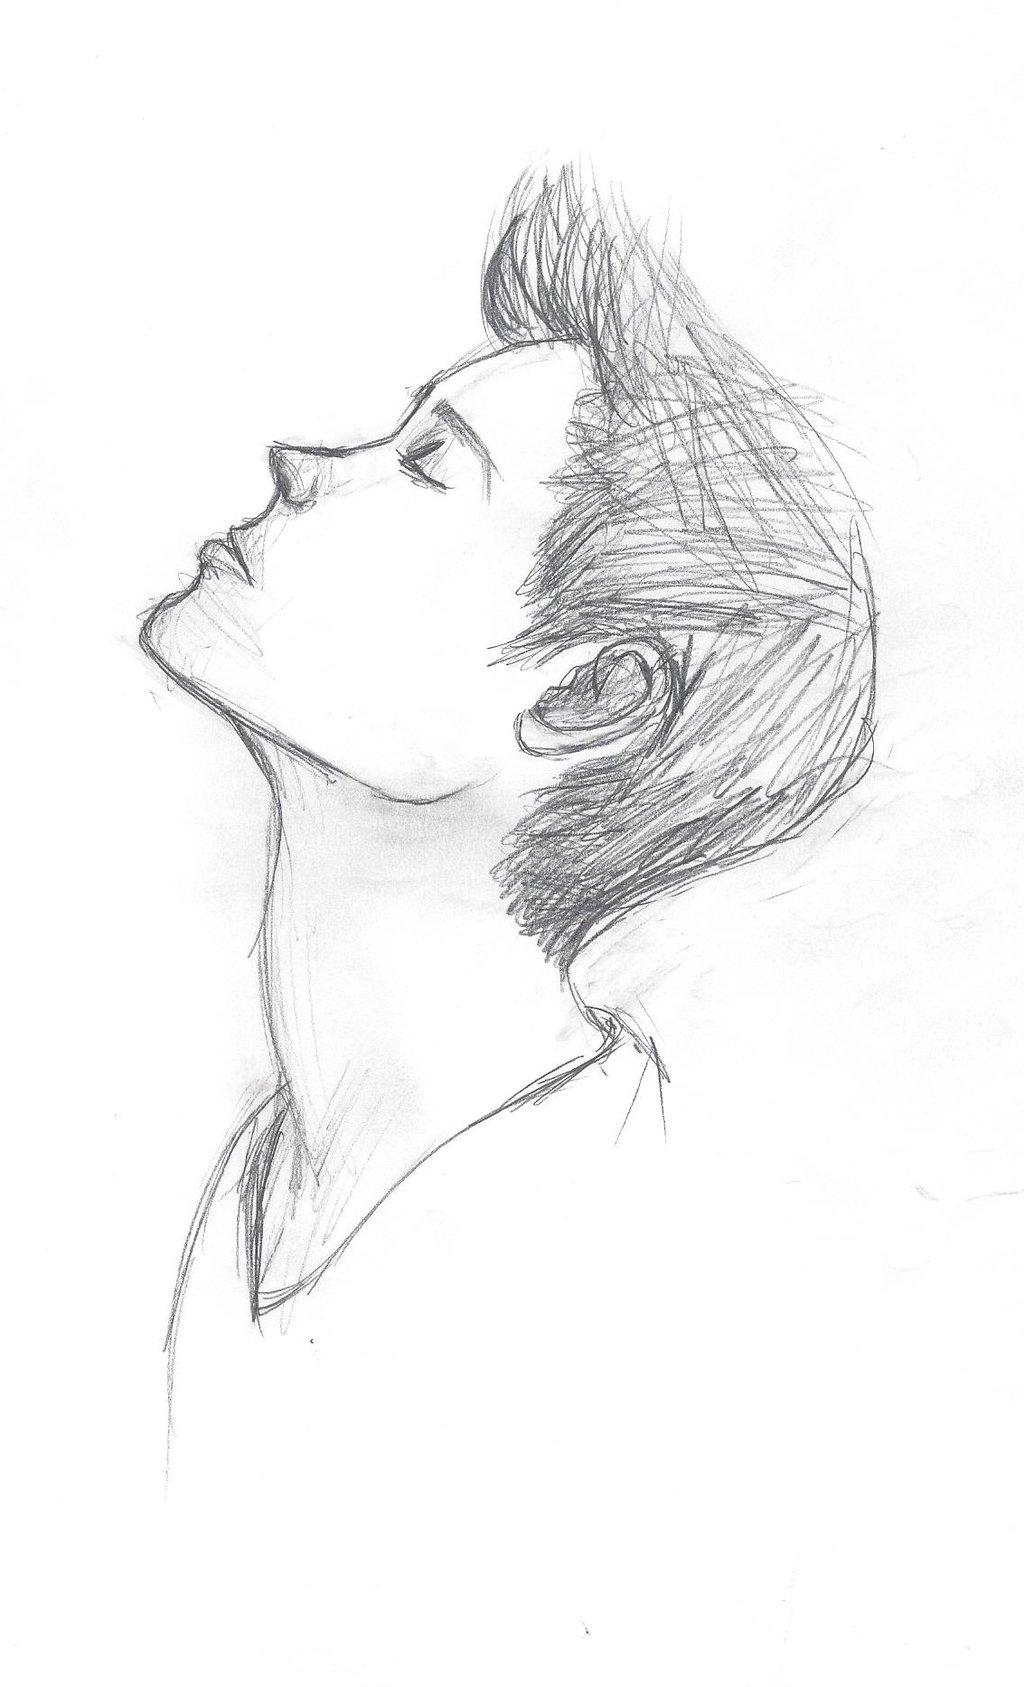 Drawn ballerine man easy … easy More drawing easy